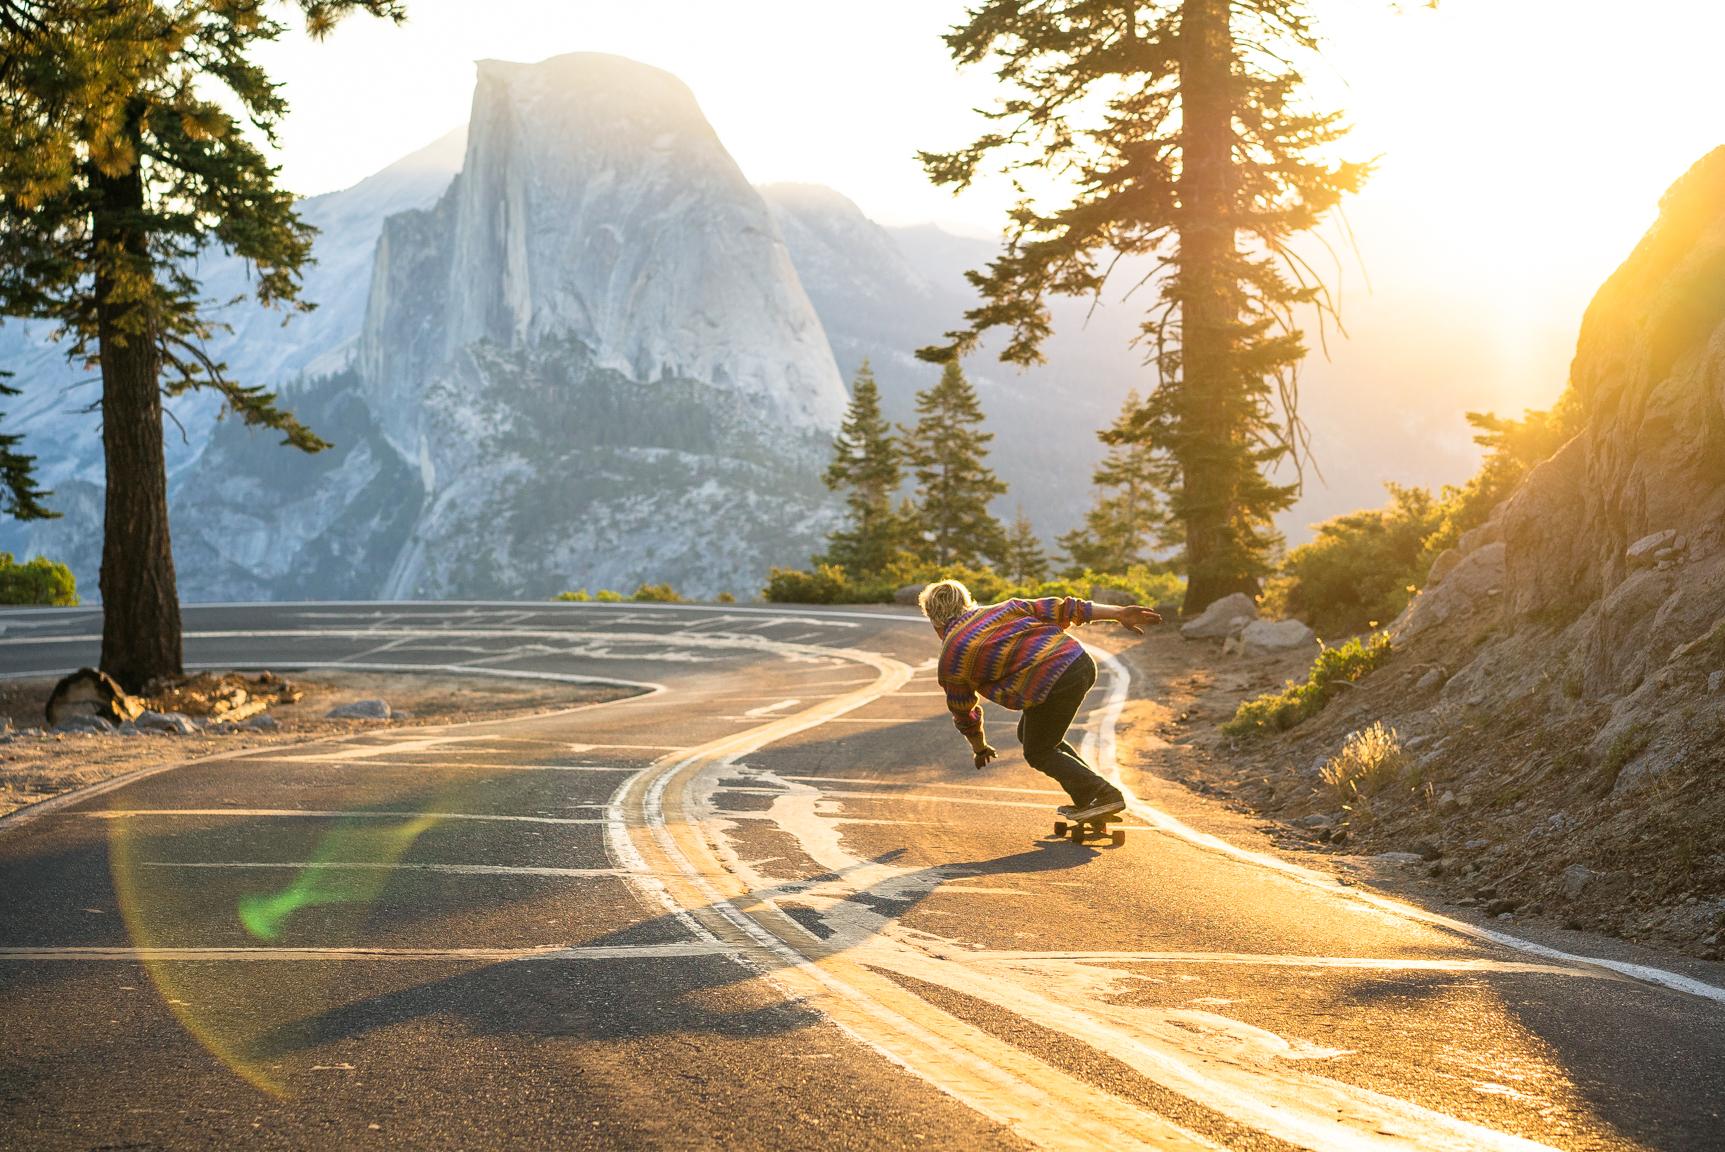 Anders Johnson, Yosemite, California